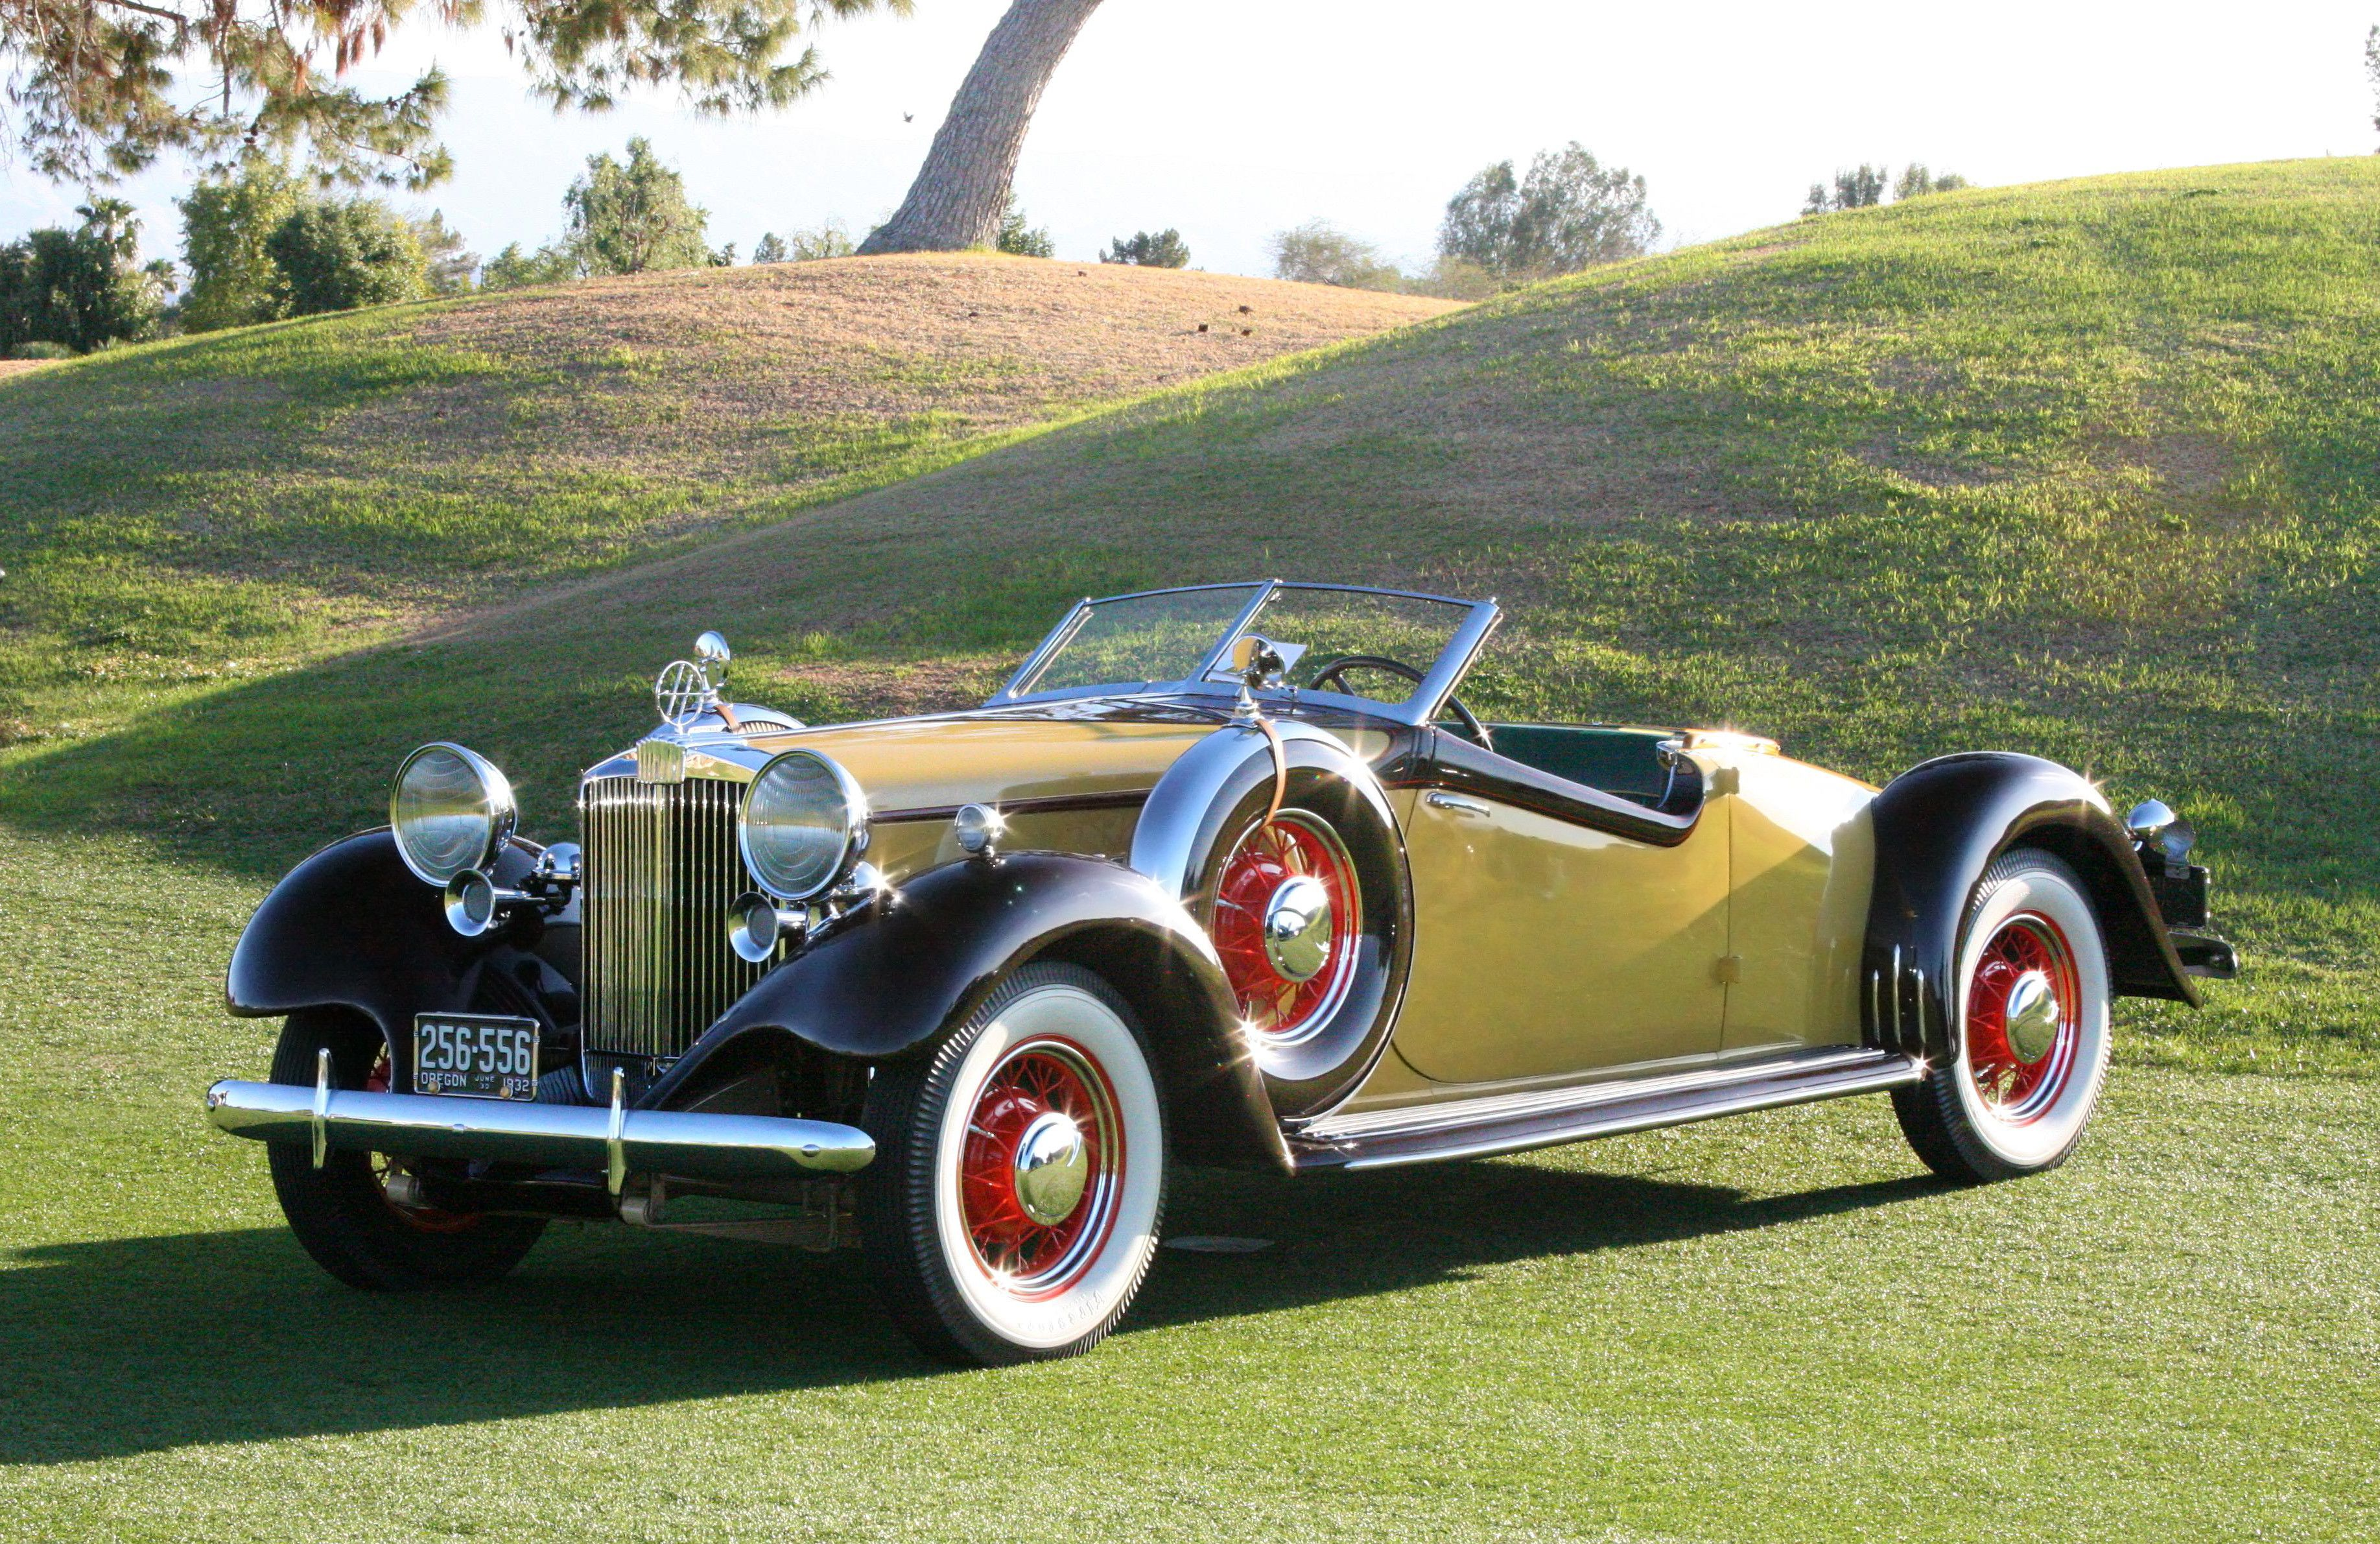 1941 PACKARD 2 DOOR CONVERTIBLE – Barrett-Jackson Auction Company – World's Greatest Collector Car Auctions